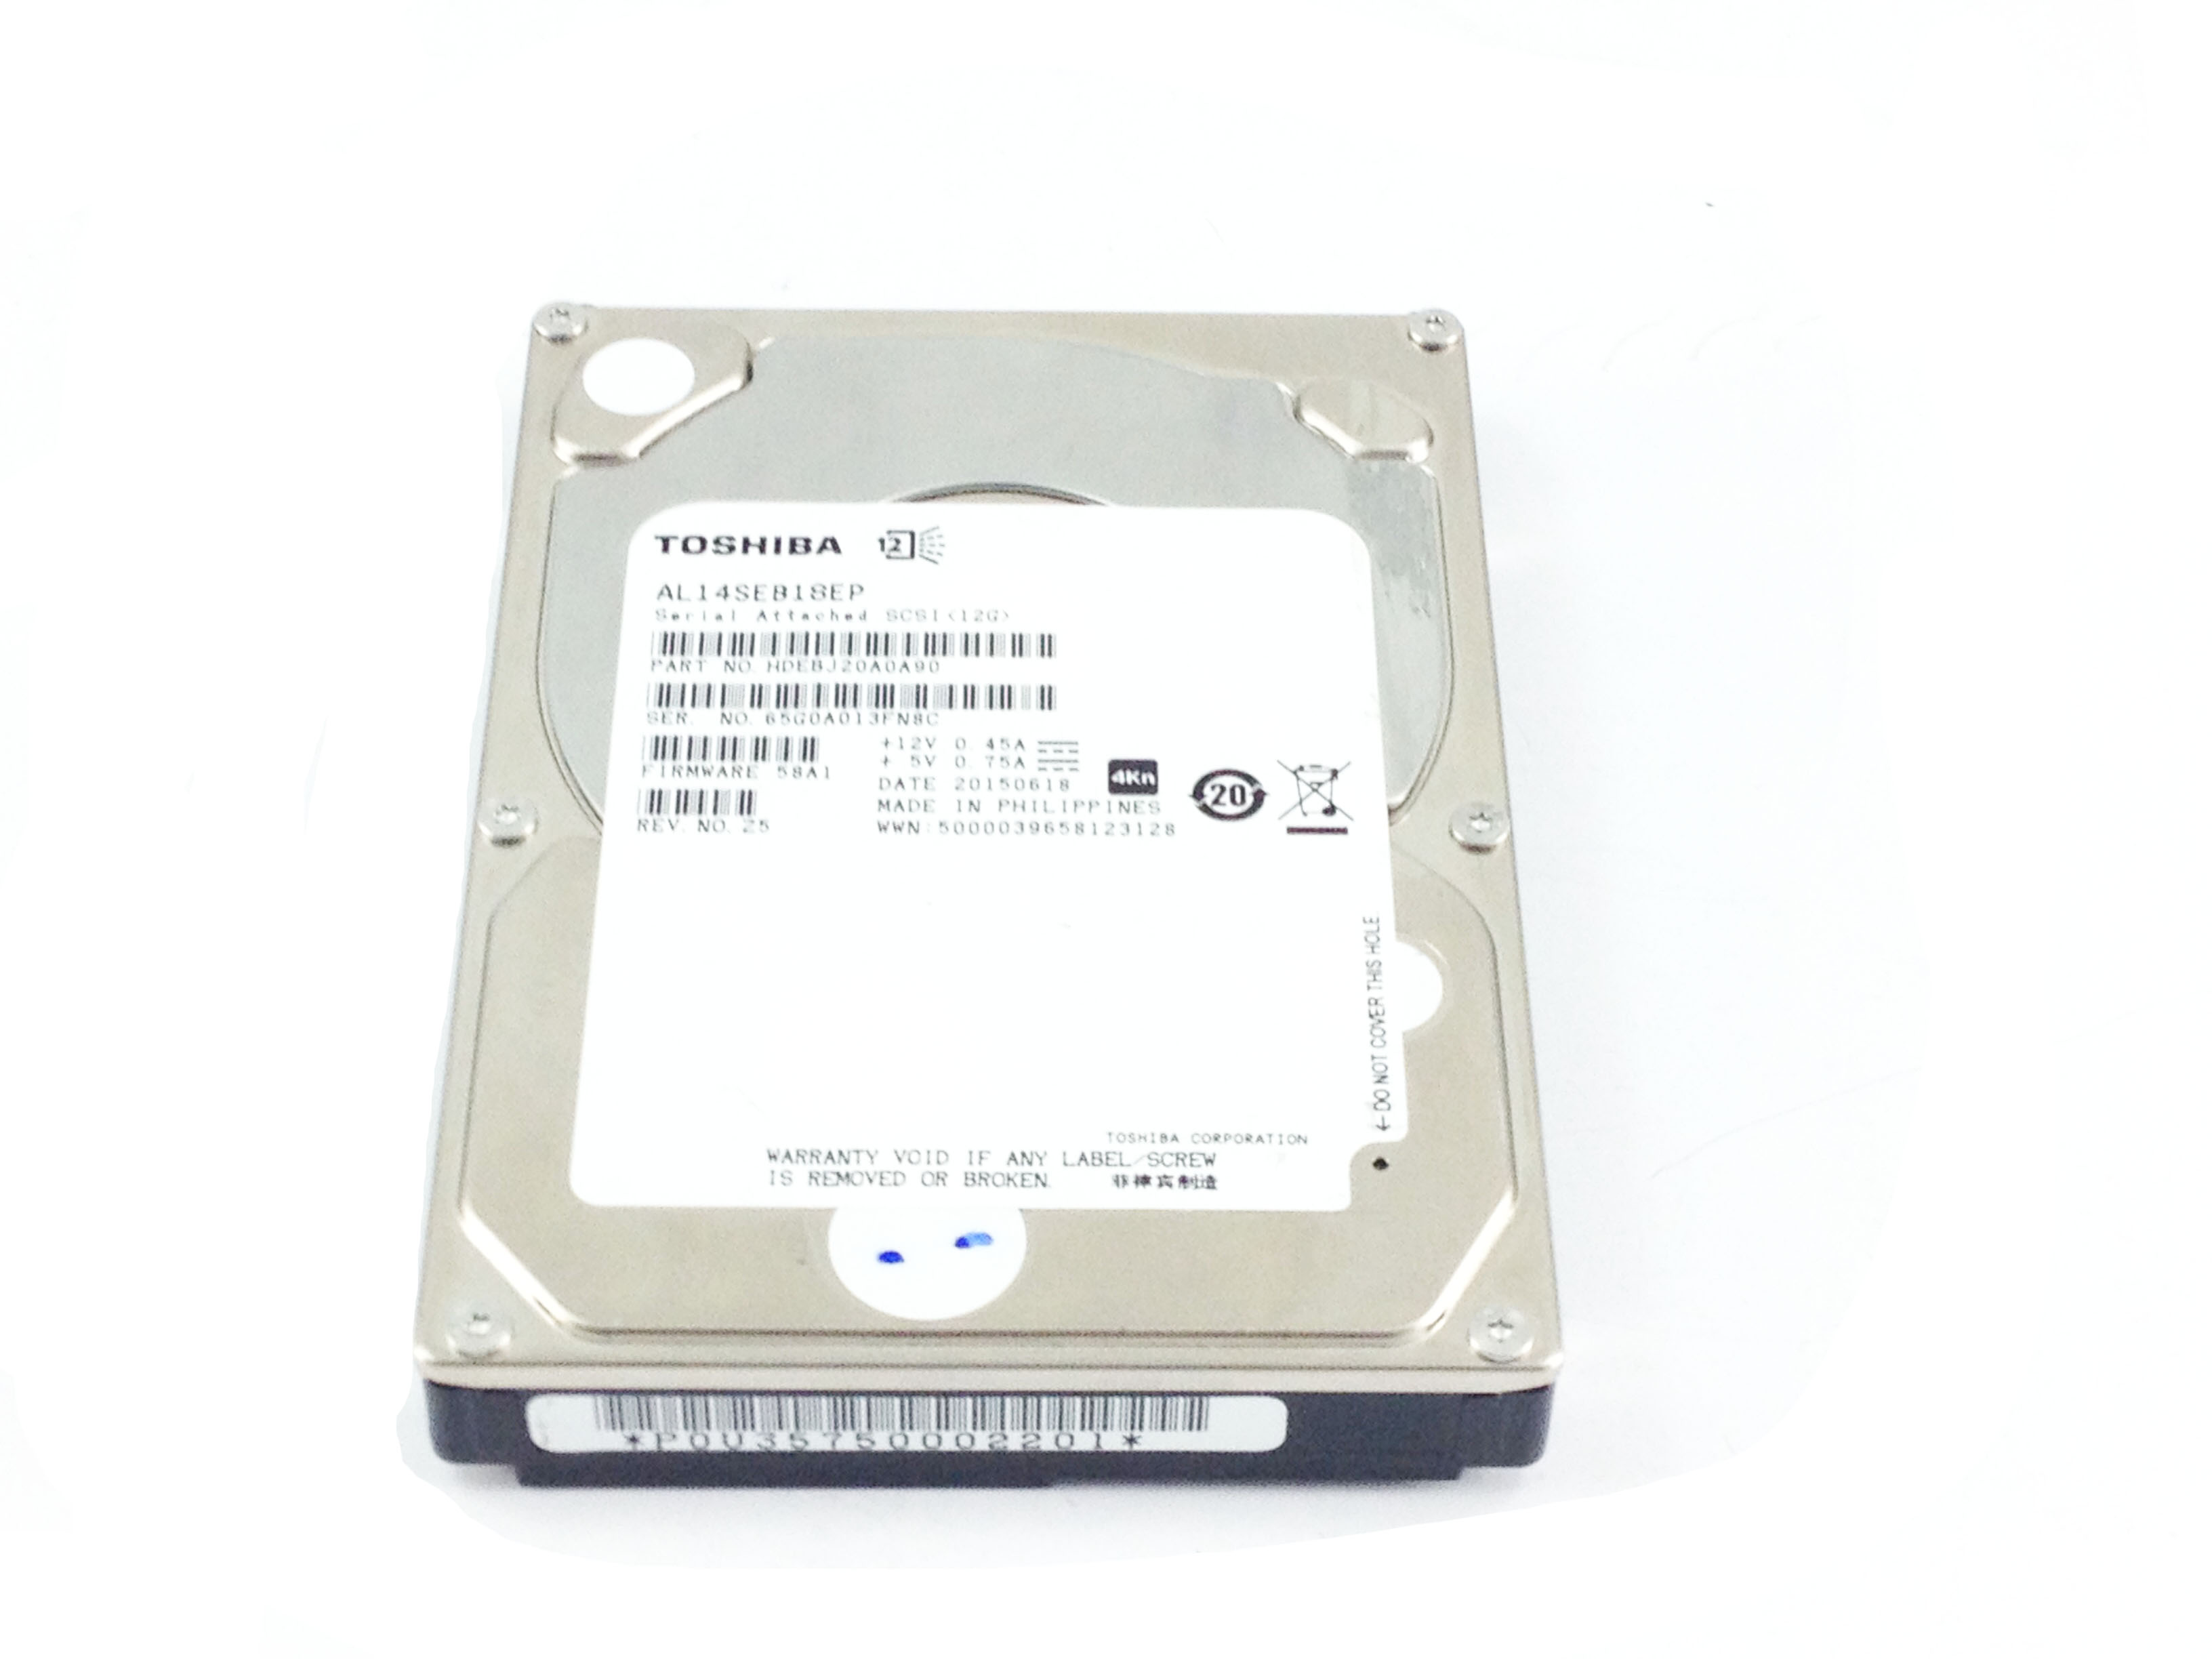 Toshiba 1.8TB 10K 12Gbps SAS 2.5'' HDD Hard Drive (AL14SEB18EP)